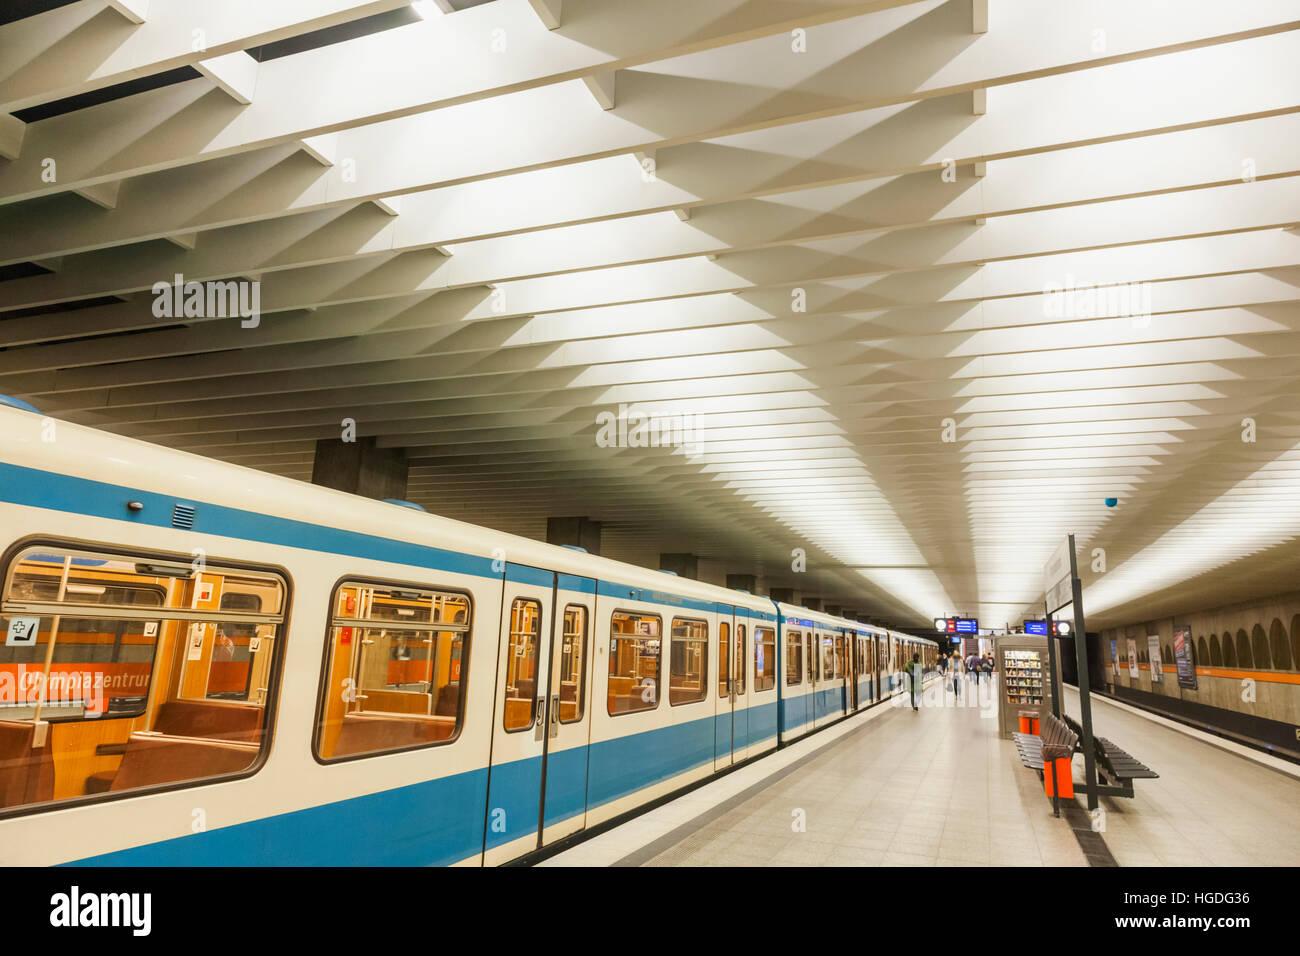 Germany, Bavaria, Munich, Subway, Subway Platform and Train - Stock Image